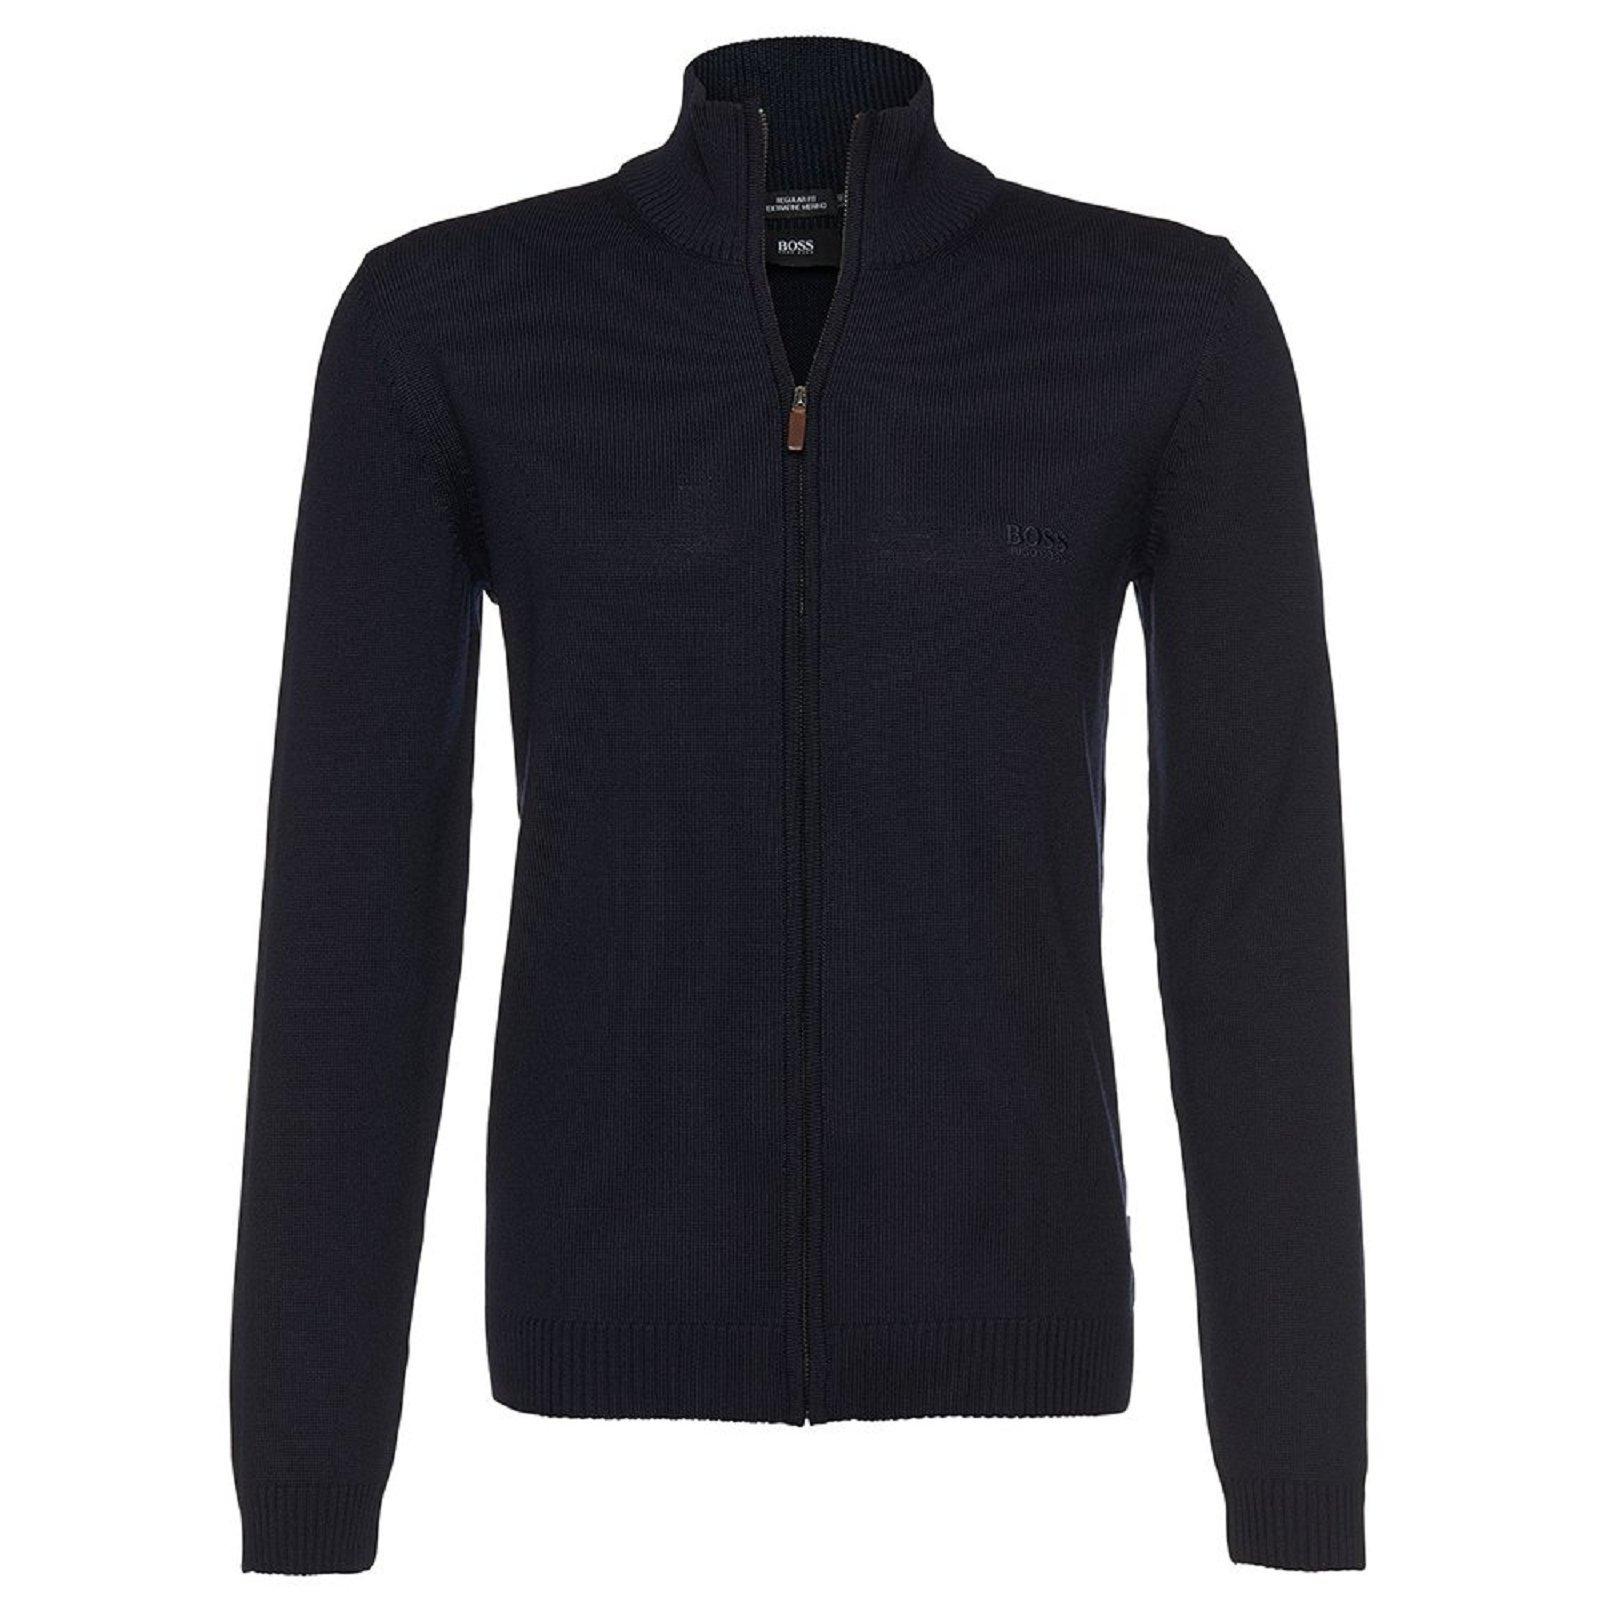 hugo boss gilet zippe en laine marine 50298475 gilet pour homme. Black Bedroom Furniture Sets. Home Design Ideas